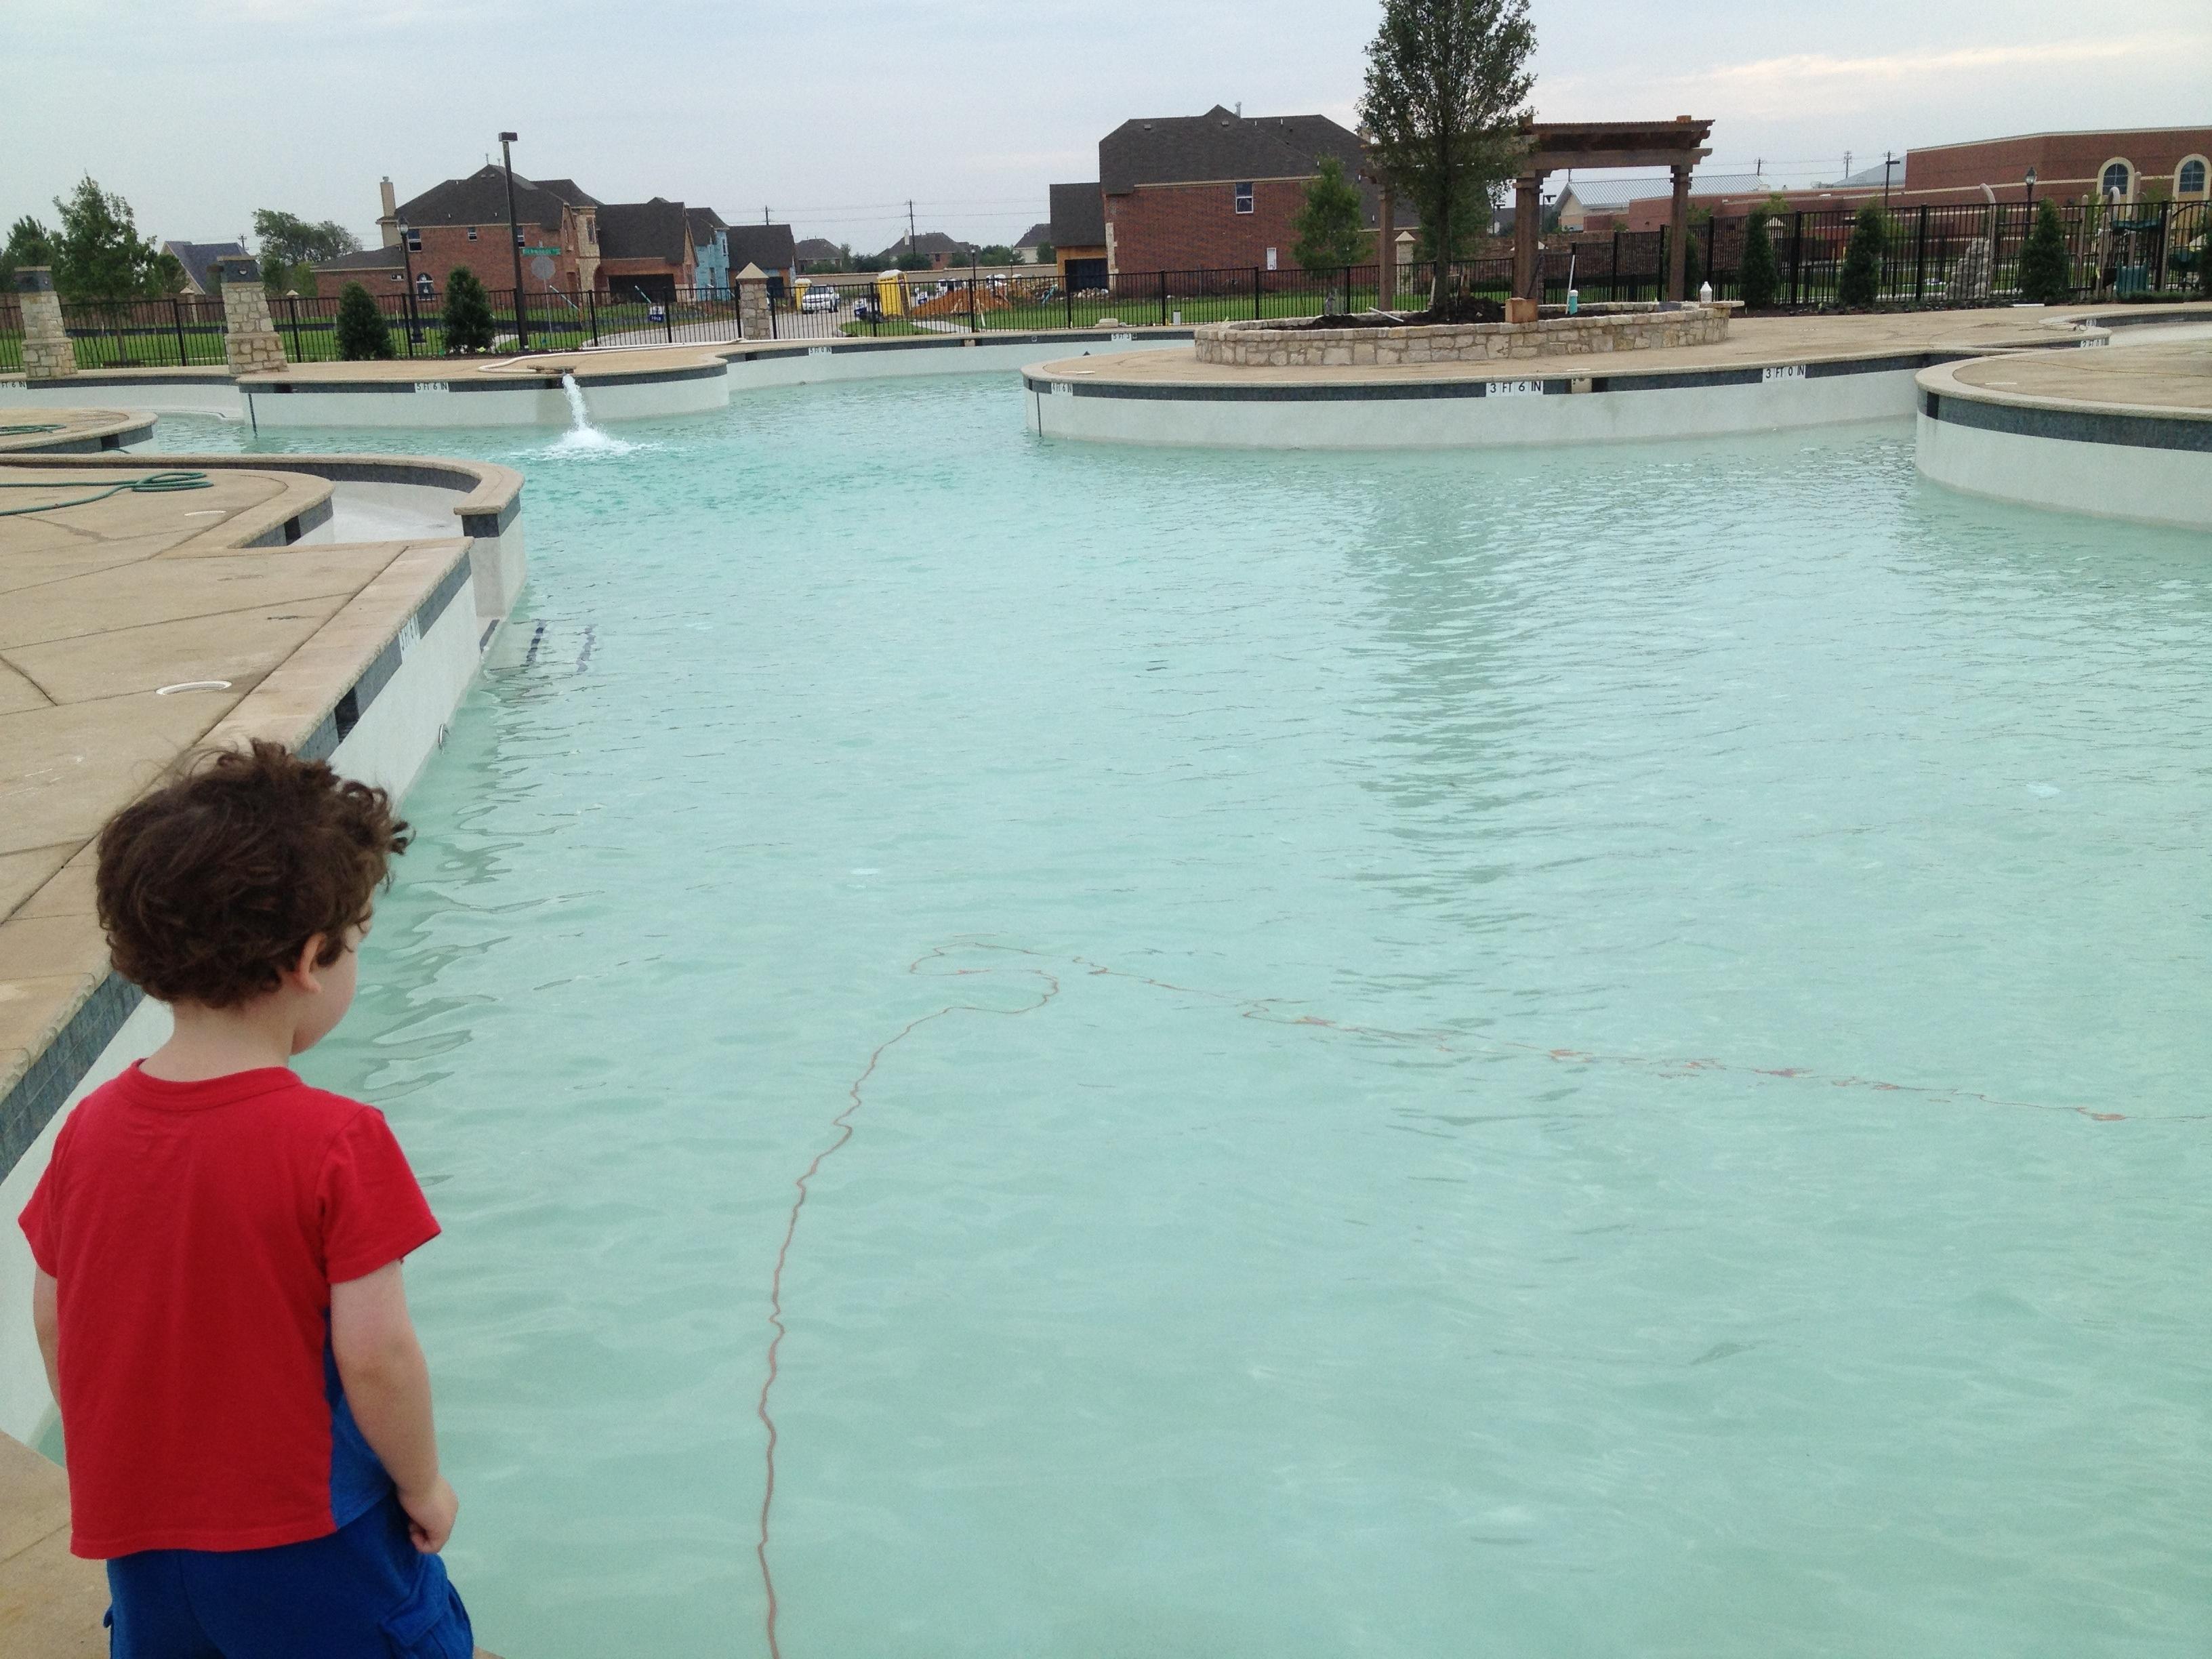 Richwoods Pool In Frisco Has Water Update Frisco Richwoods Lexington Frisco Phillips